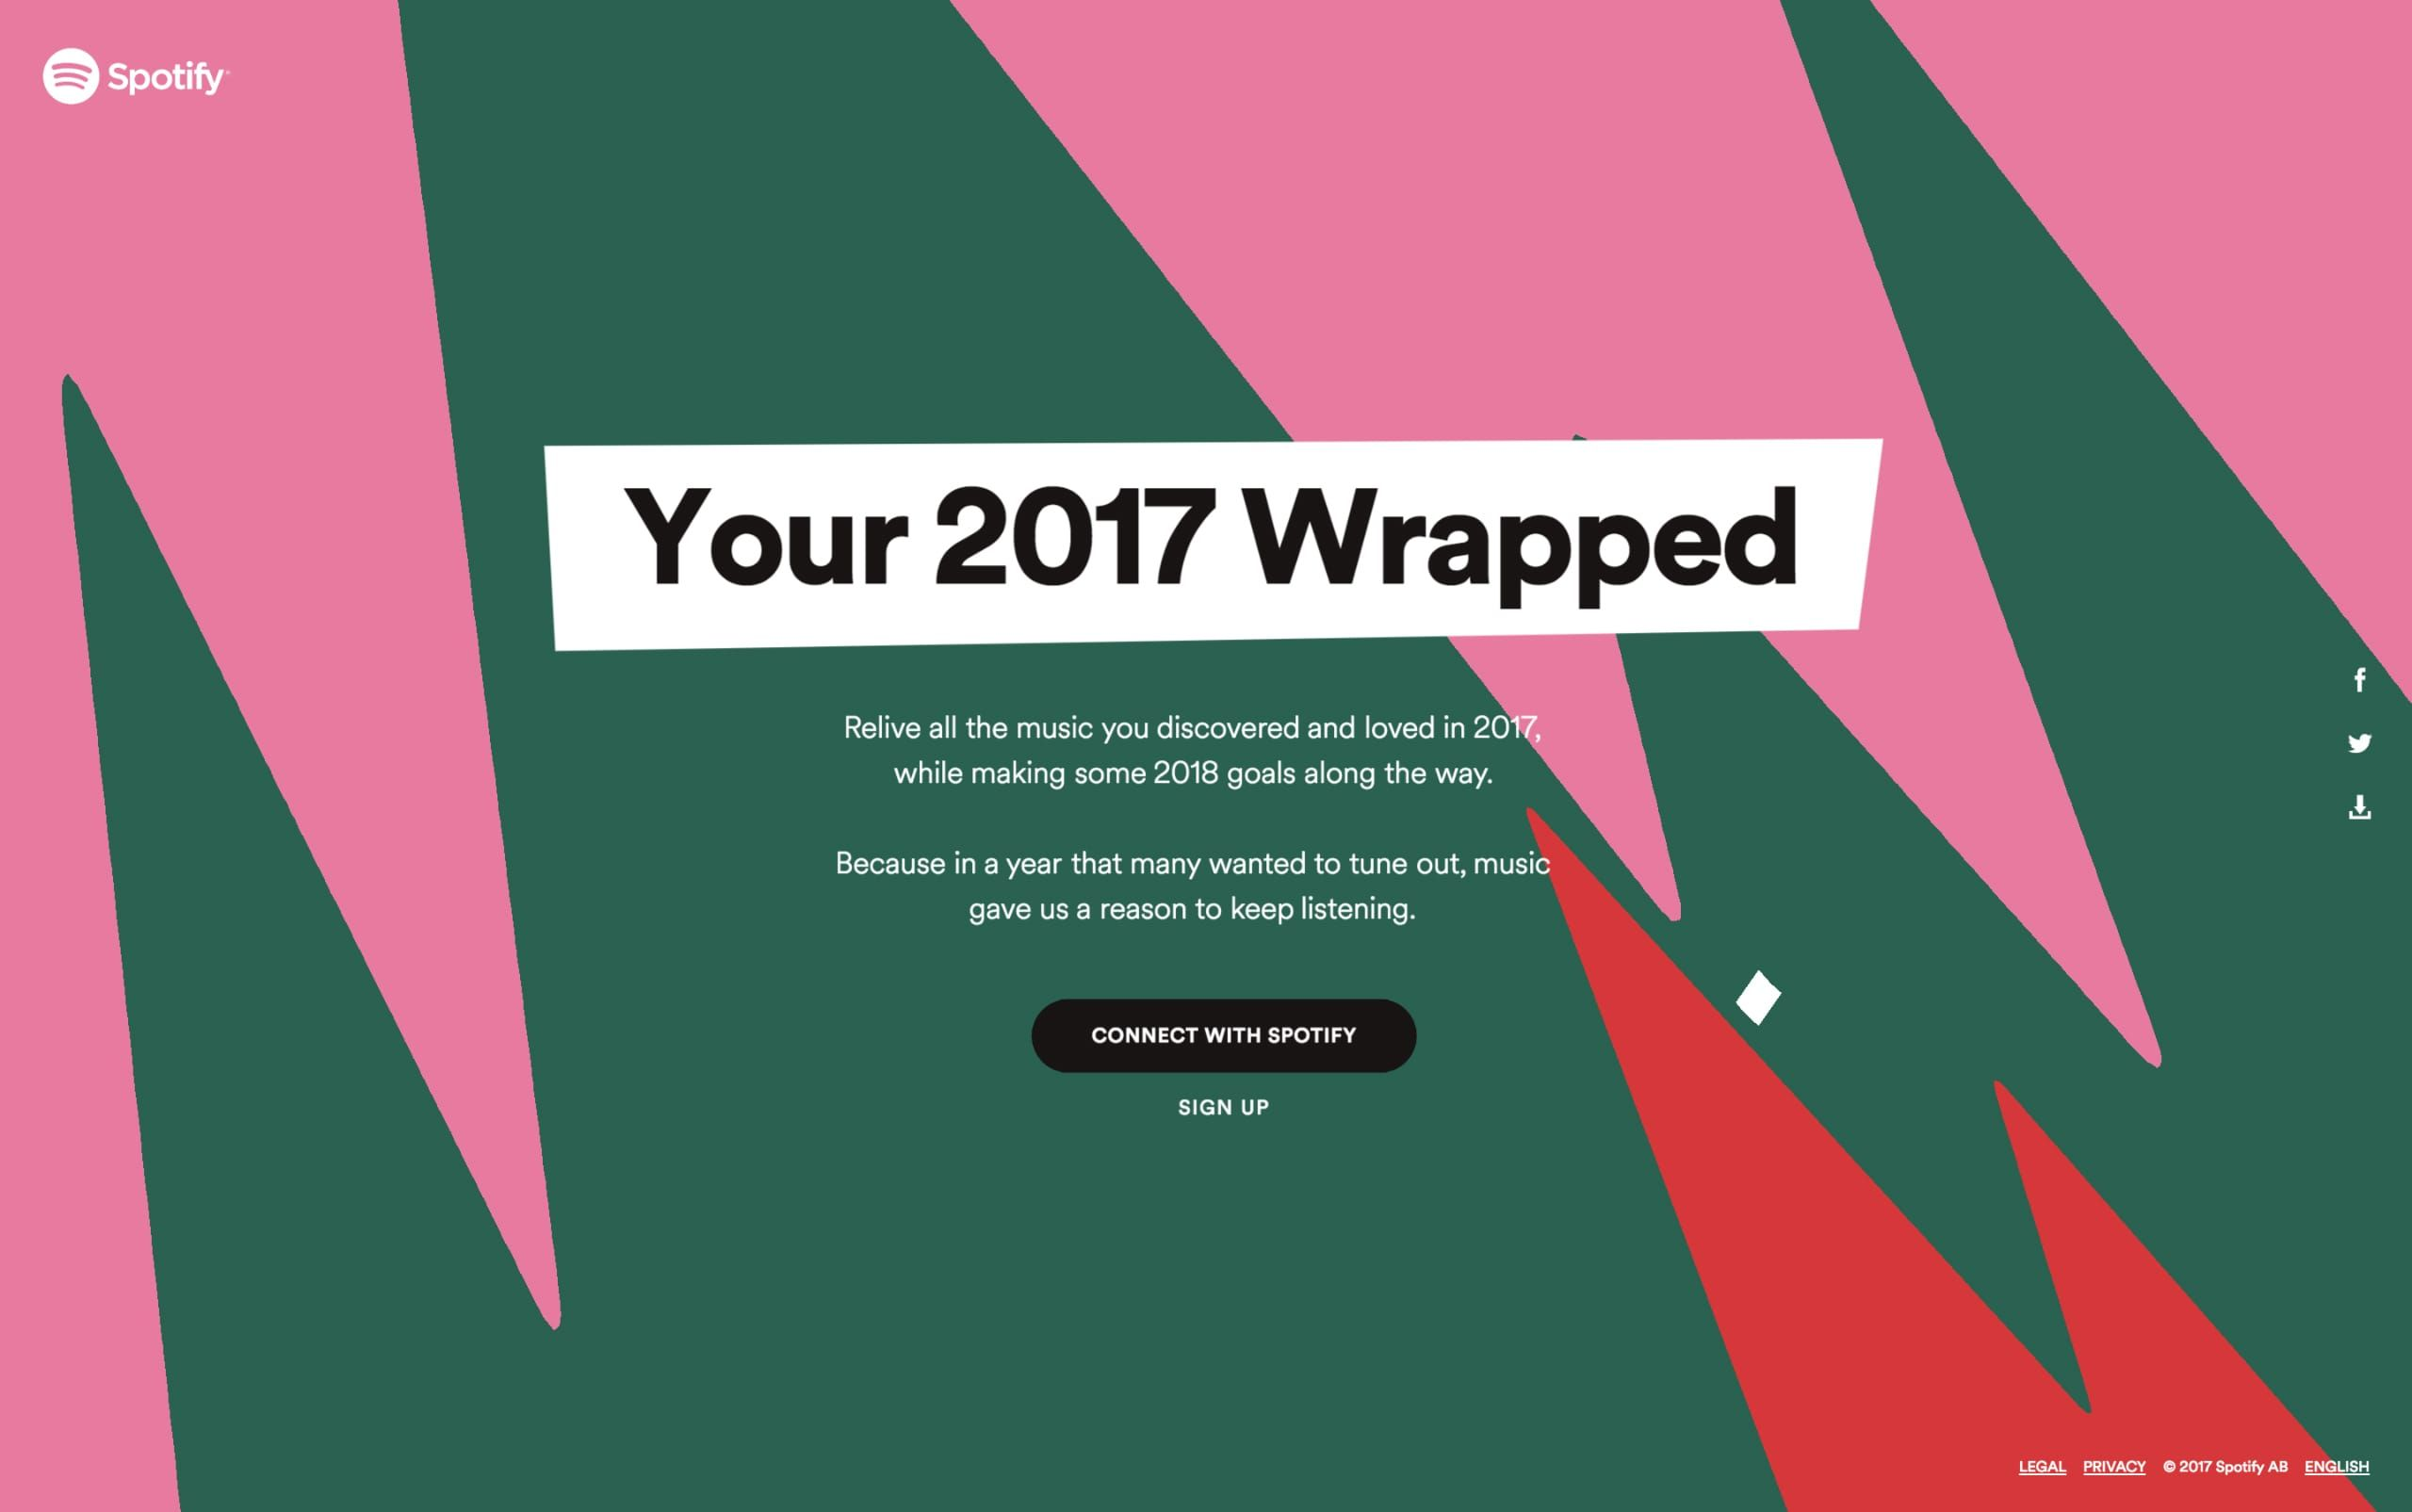 Your 2017 Wrapped Big Screenshot Web design trends